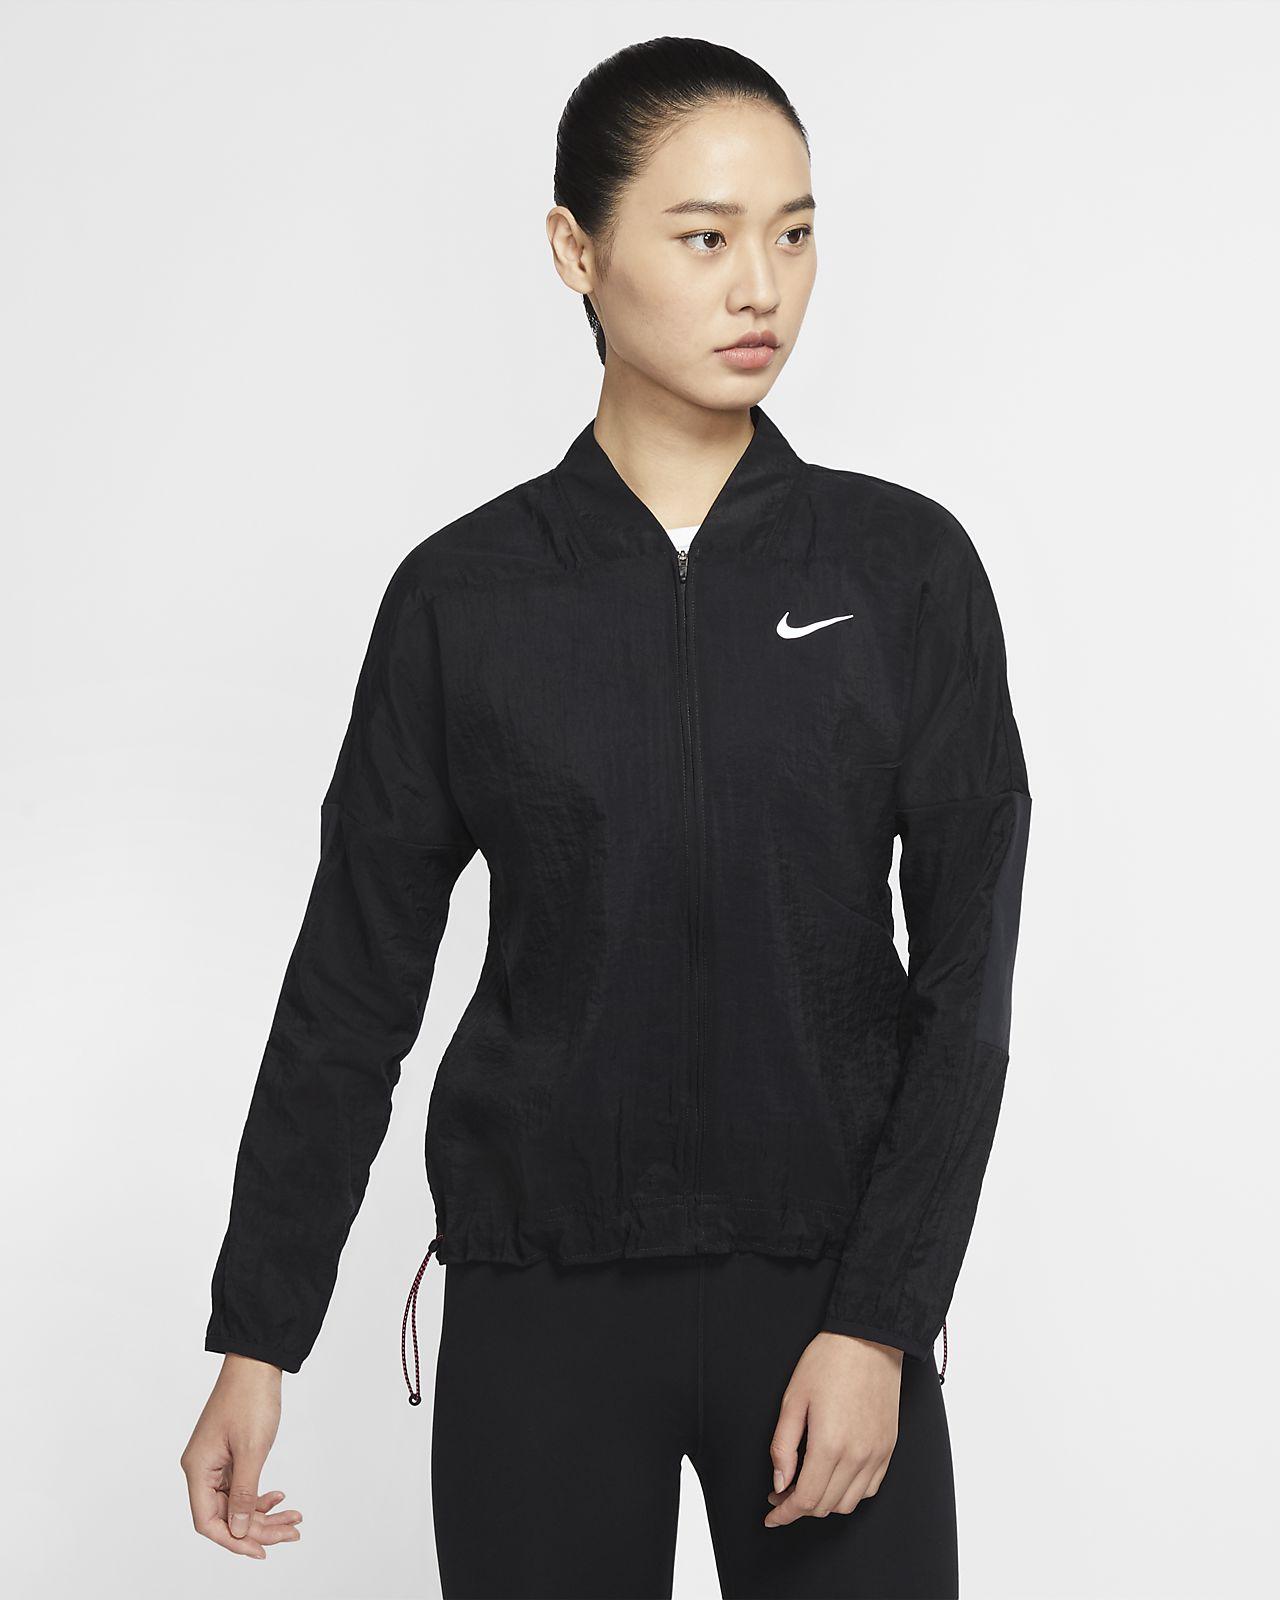 Nike Icon Clash 女子跑步夹克